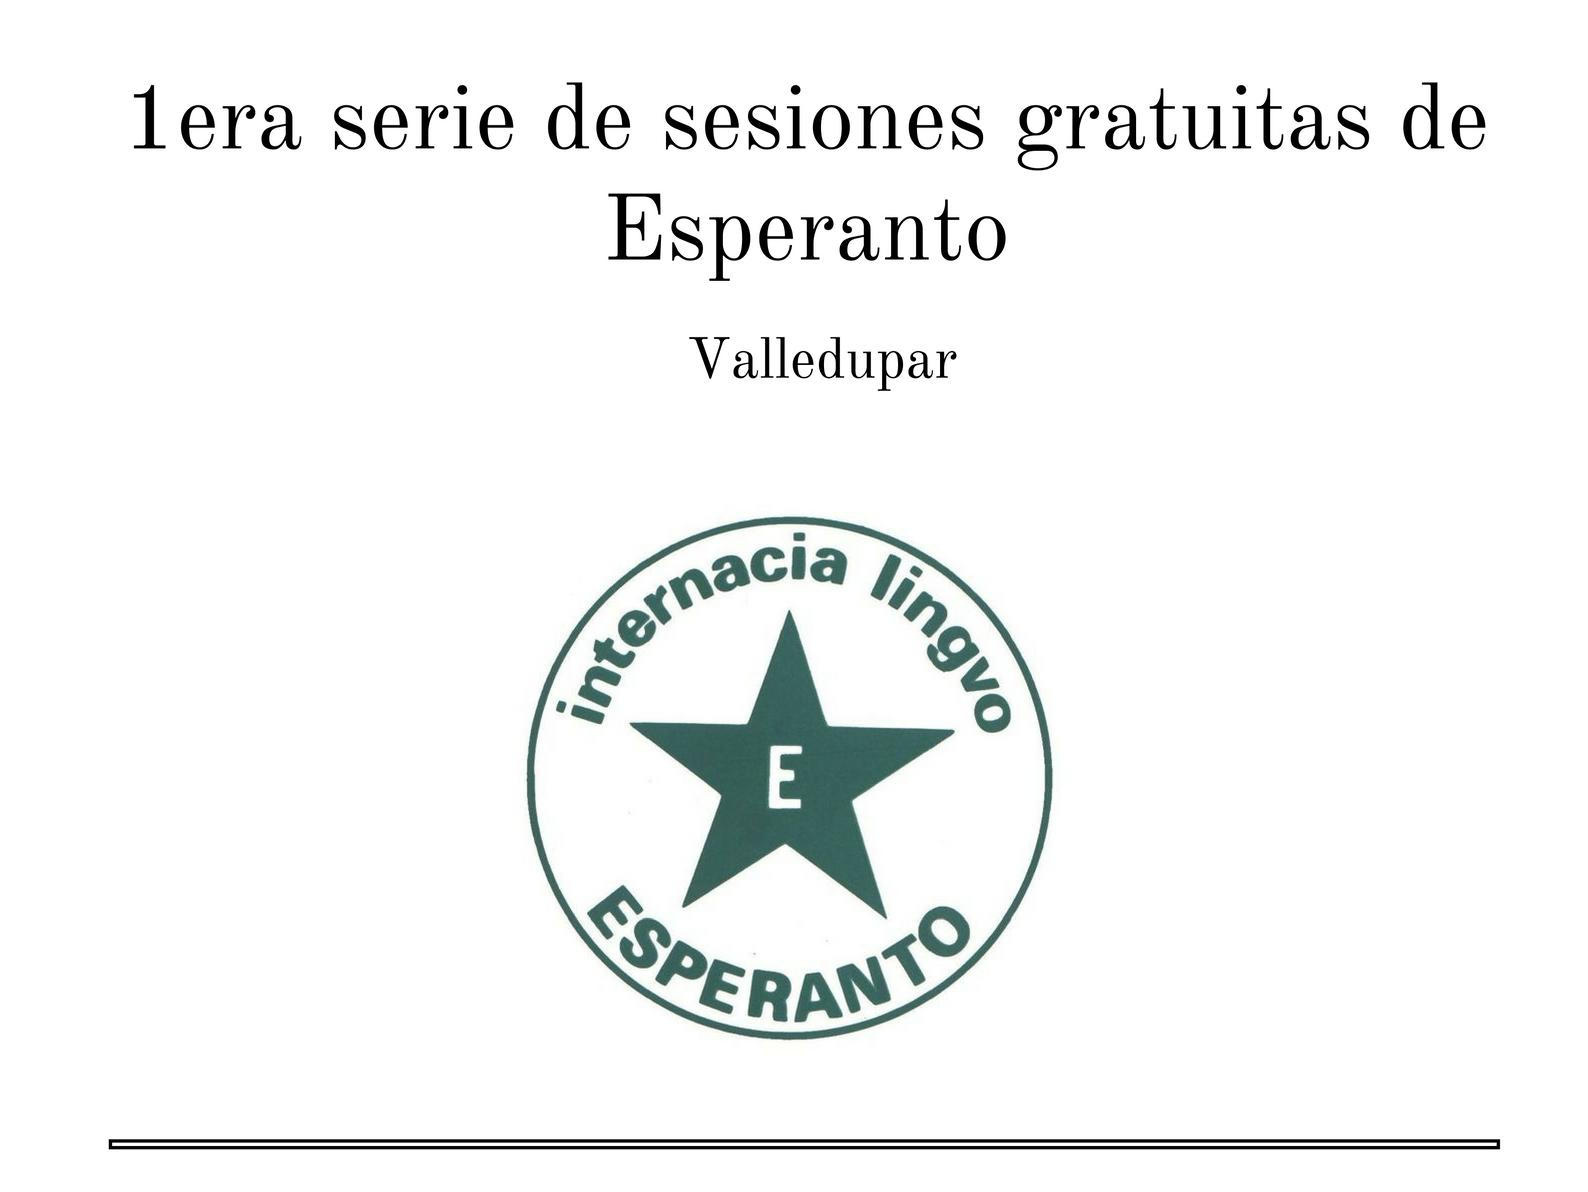 Esperanto en Valledupar 2